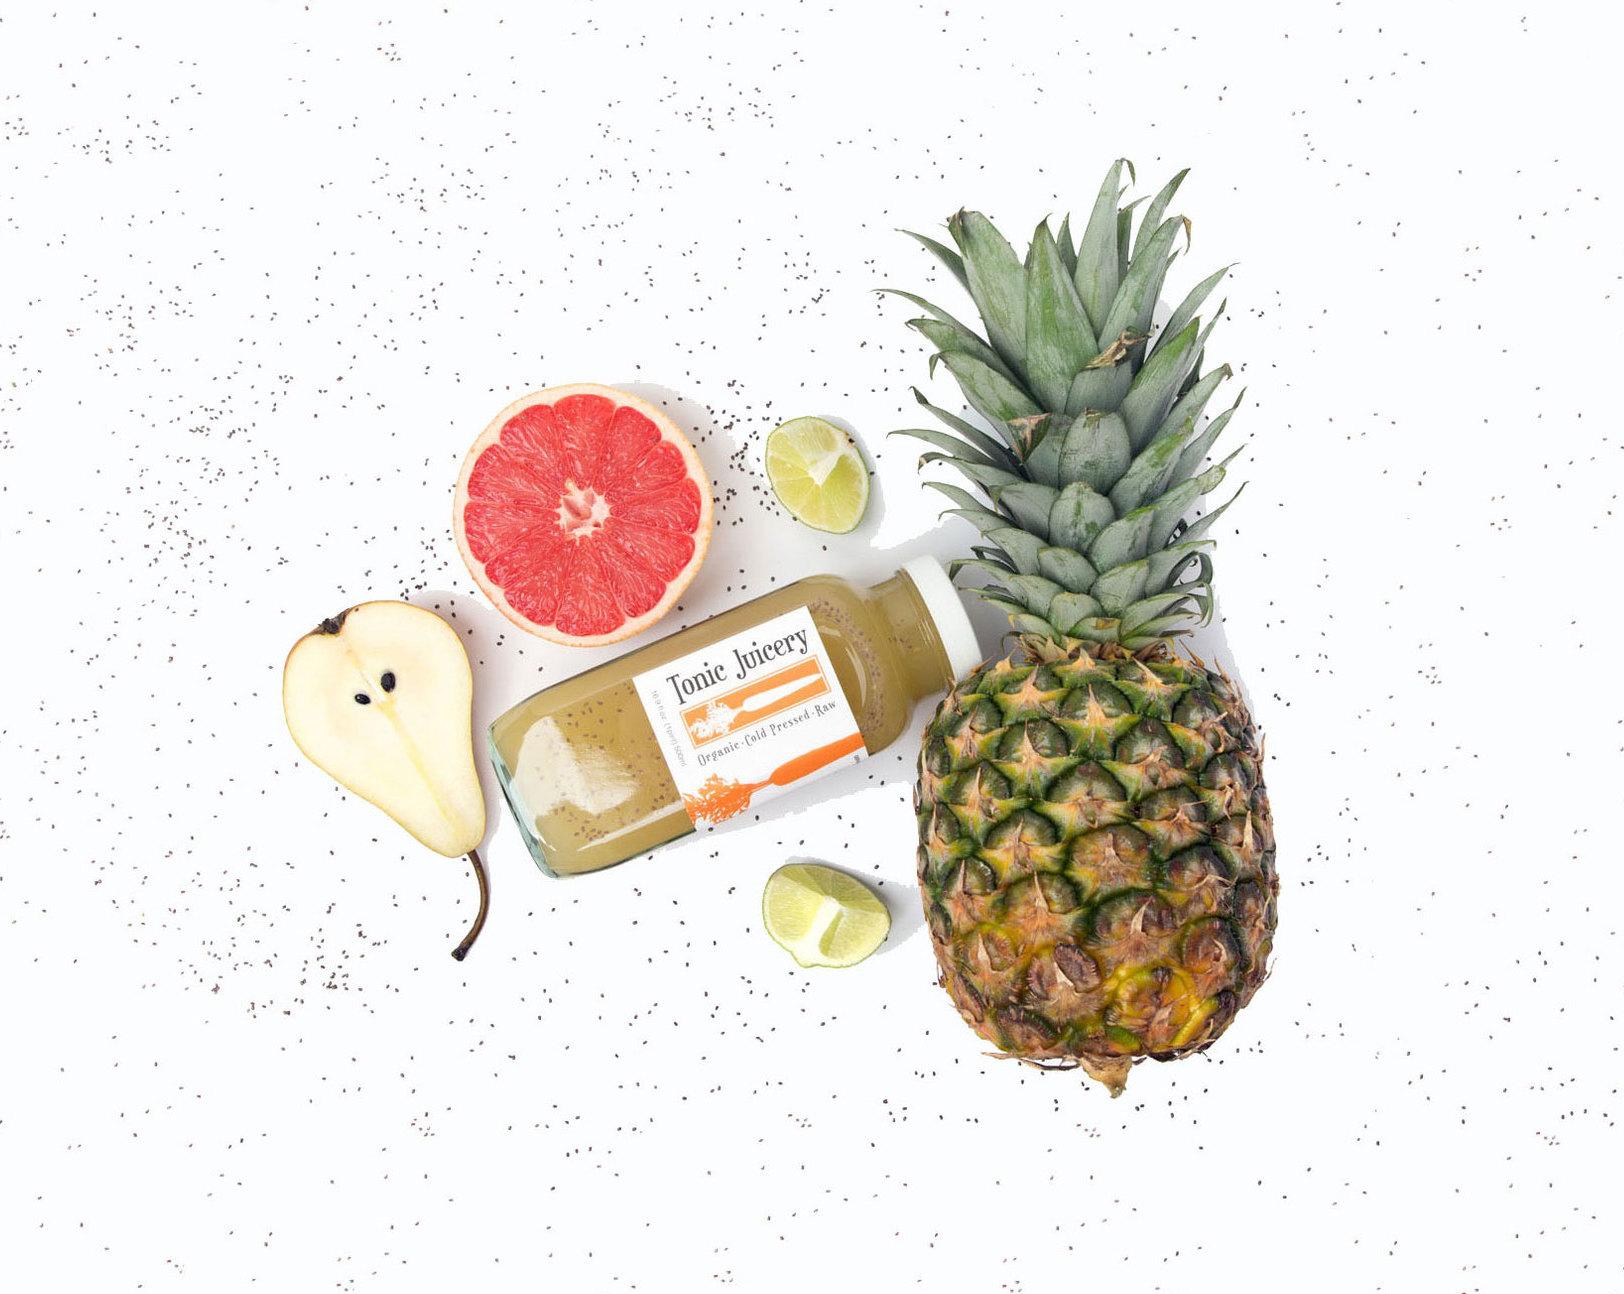 tonic-juicery-super-fresh